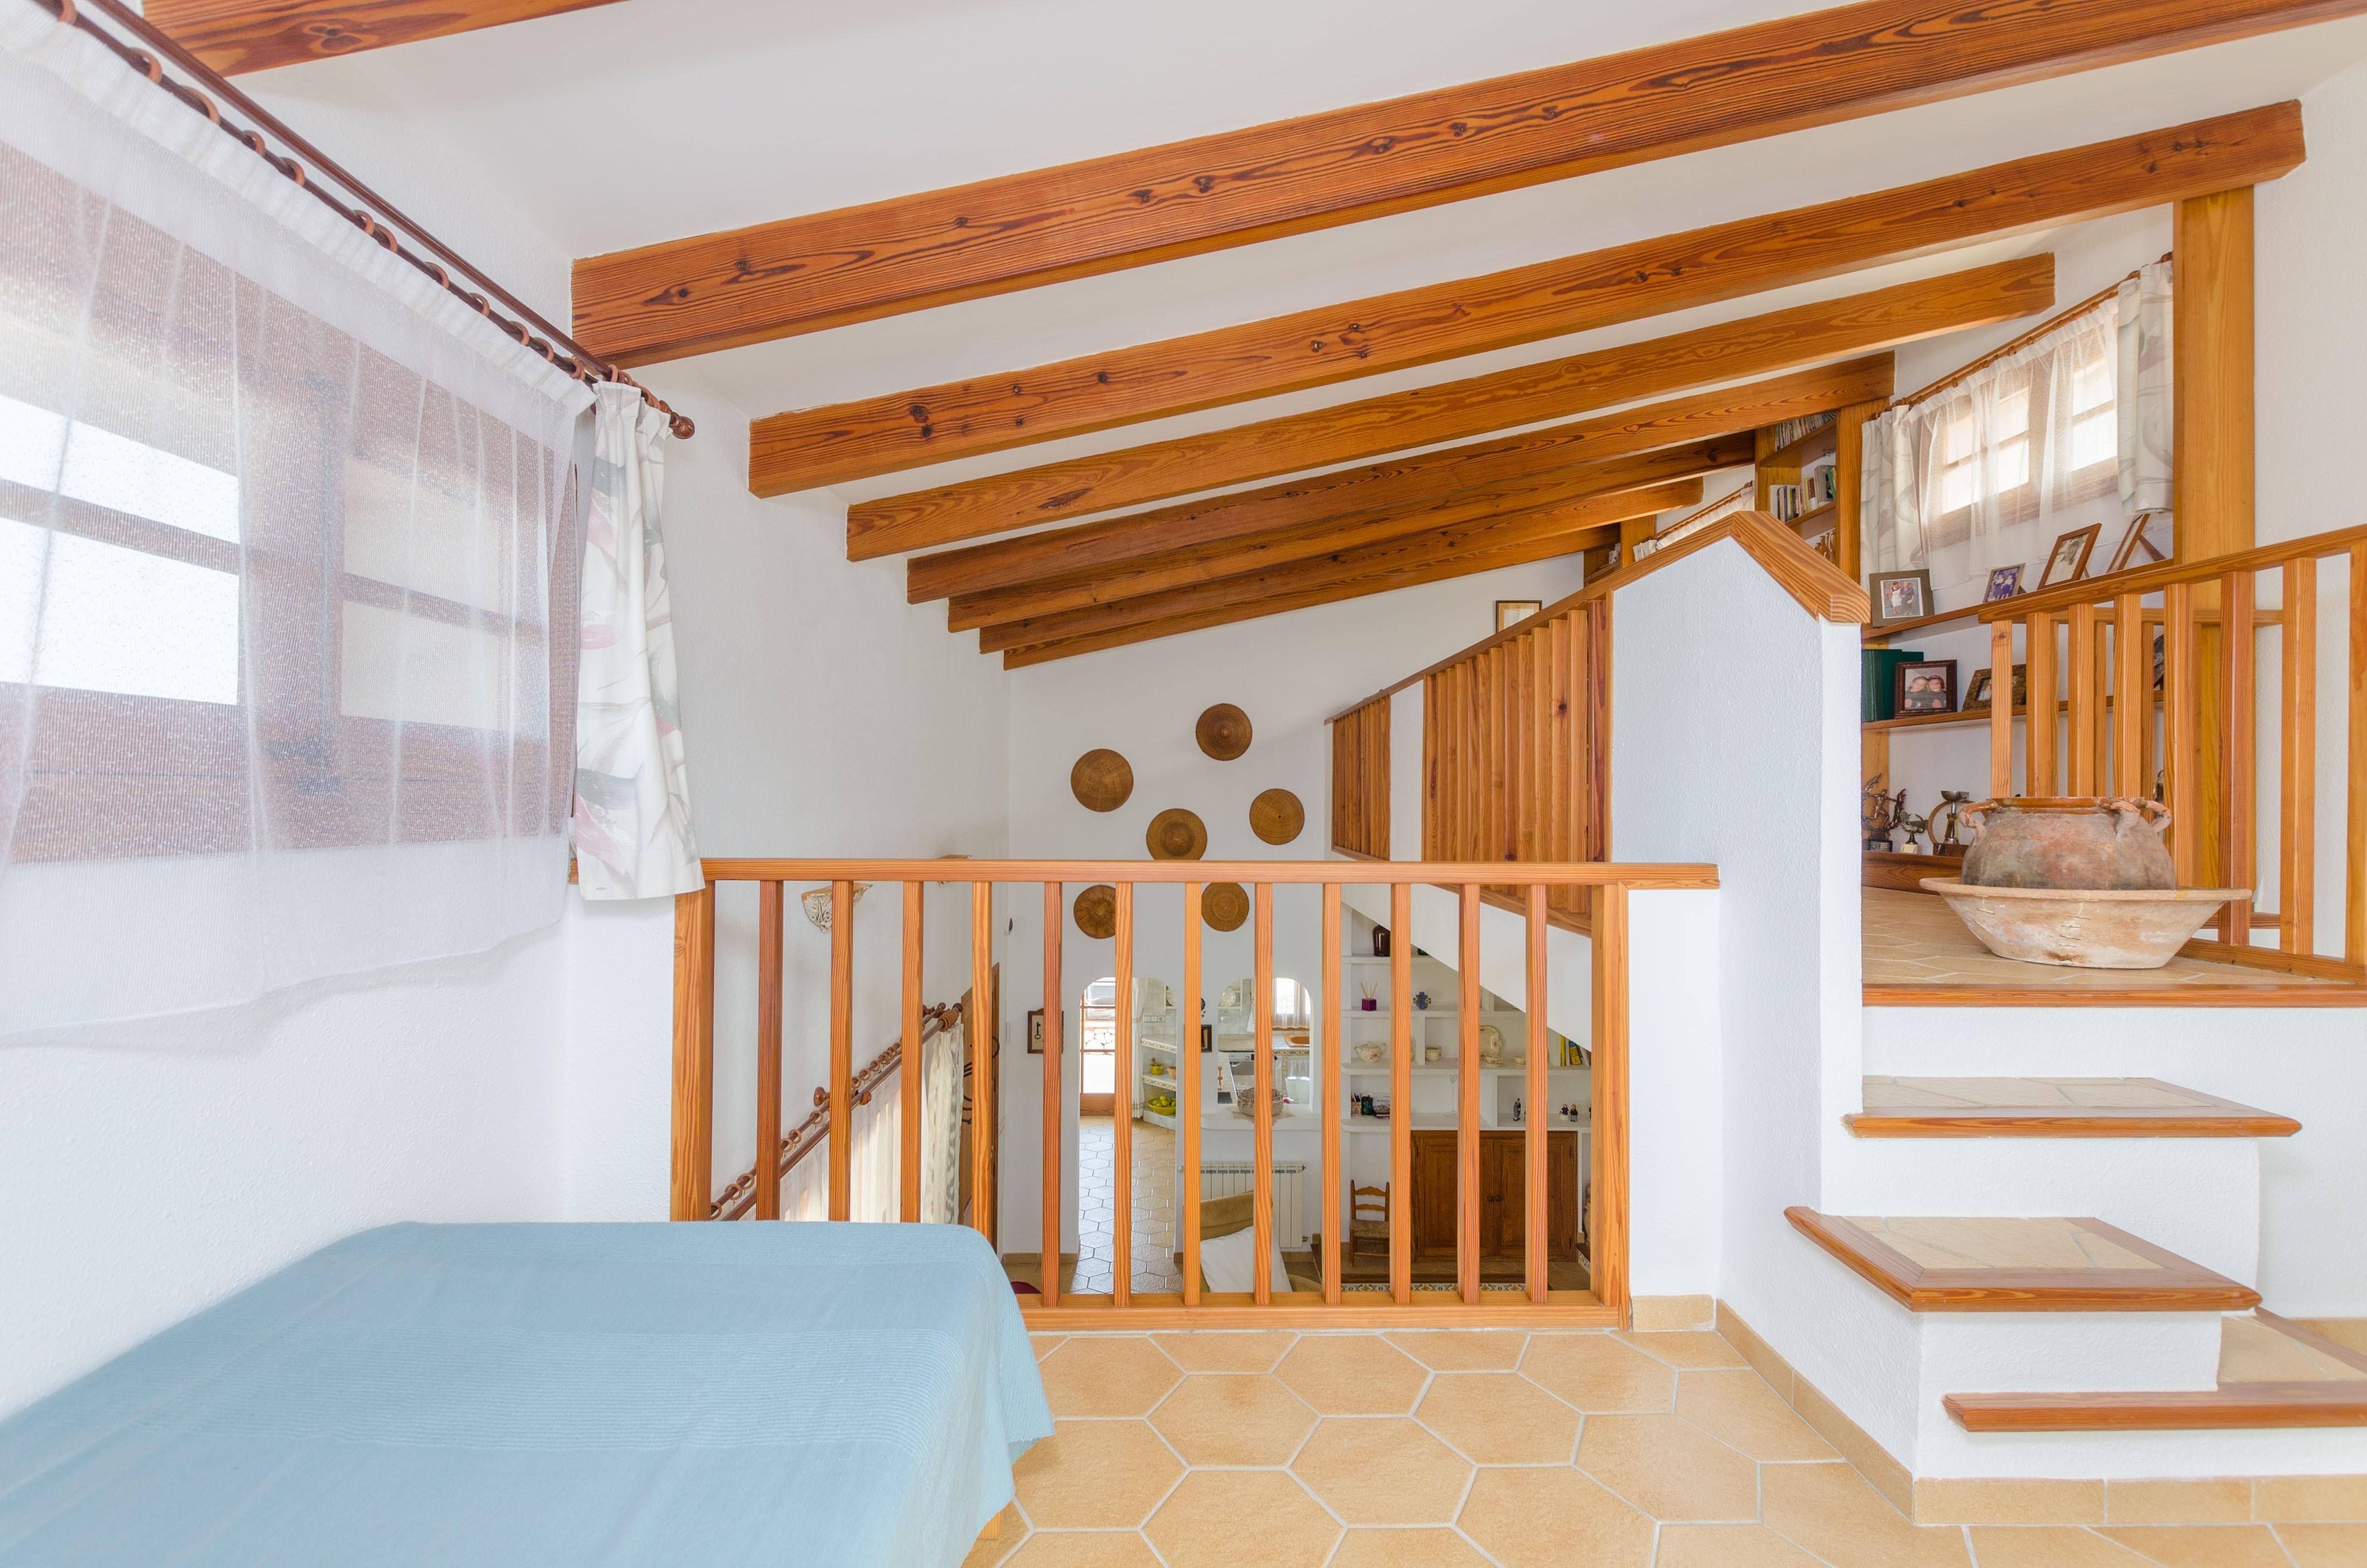 Maison de vacances SA SINIA (2374876), Lloret de Vistalegre, Majorque, Iles Baléares, Espagne, image 35